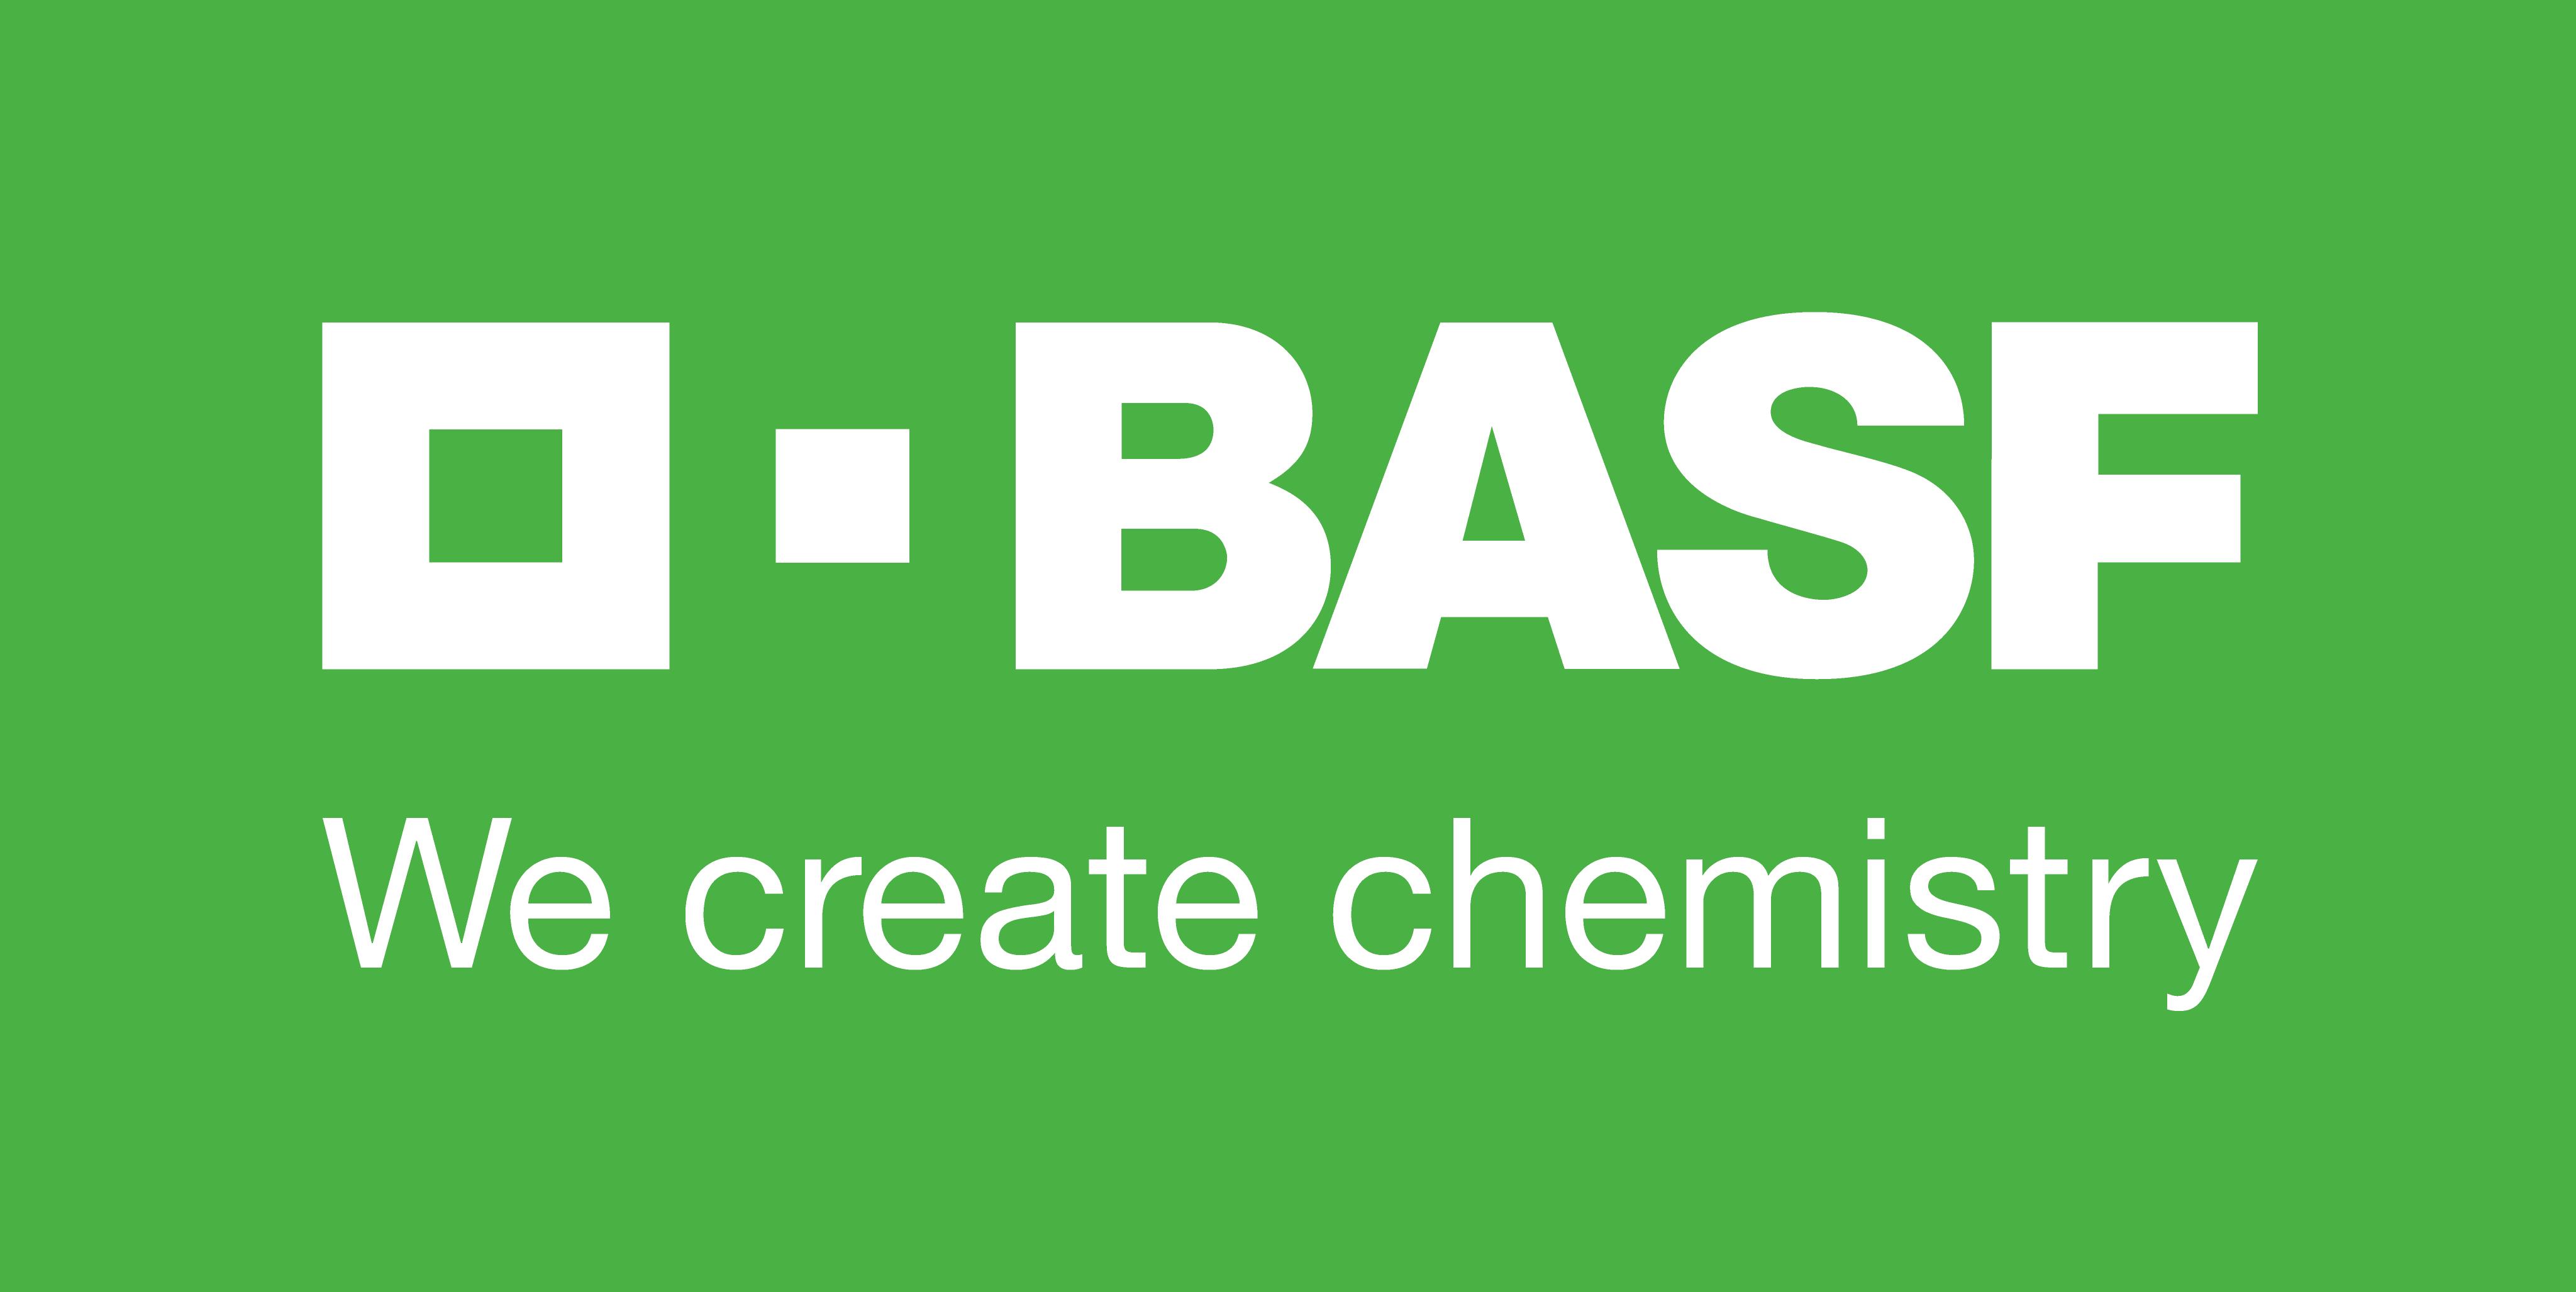 basf logo 6 - BASF Logo